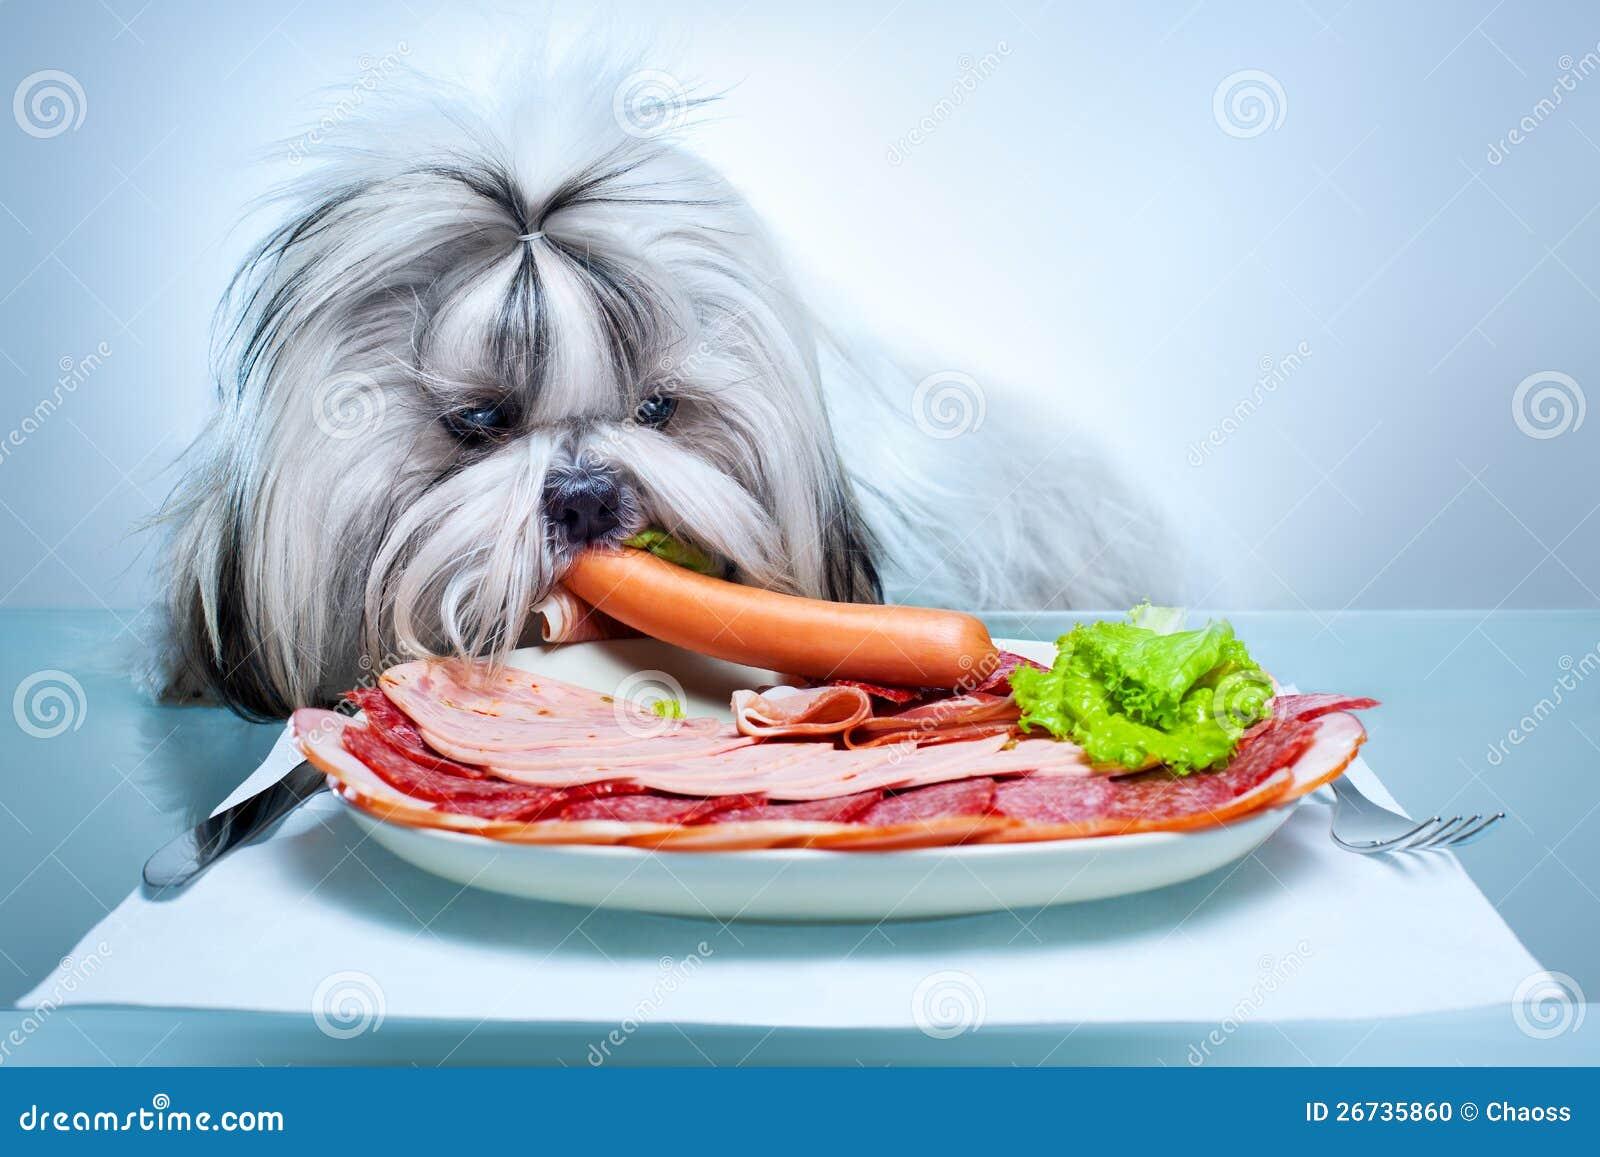 Shih tzu dog eating